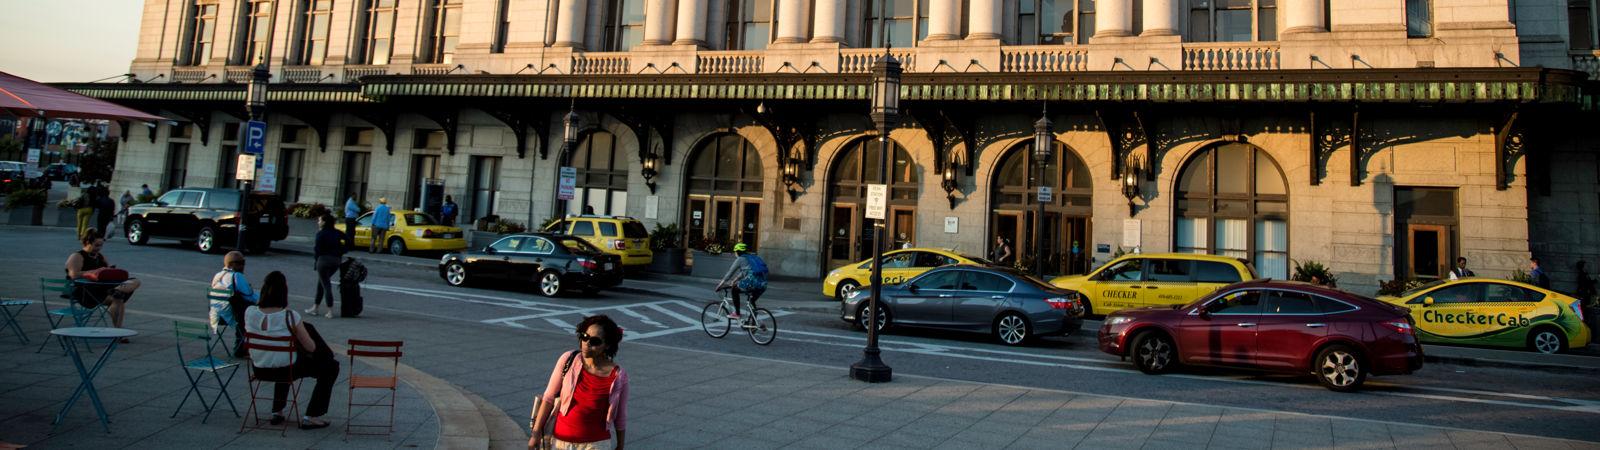 Baltimore Penn Station Front Doors